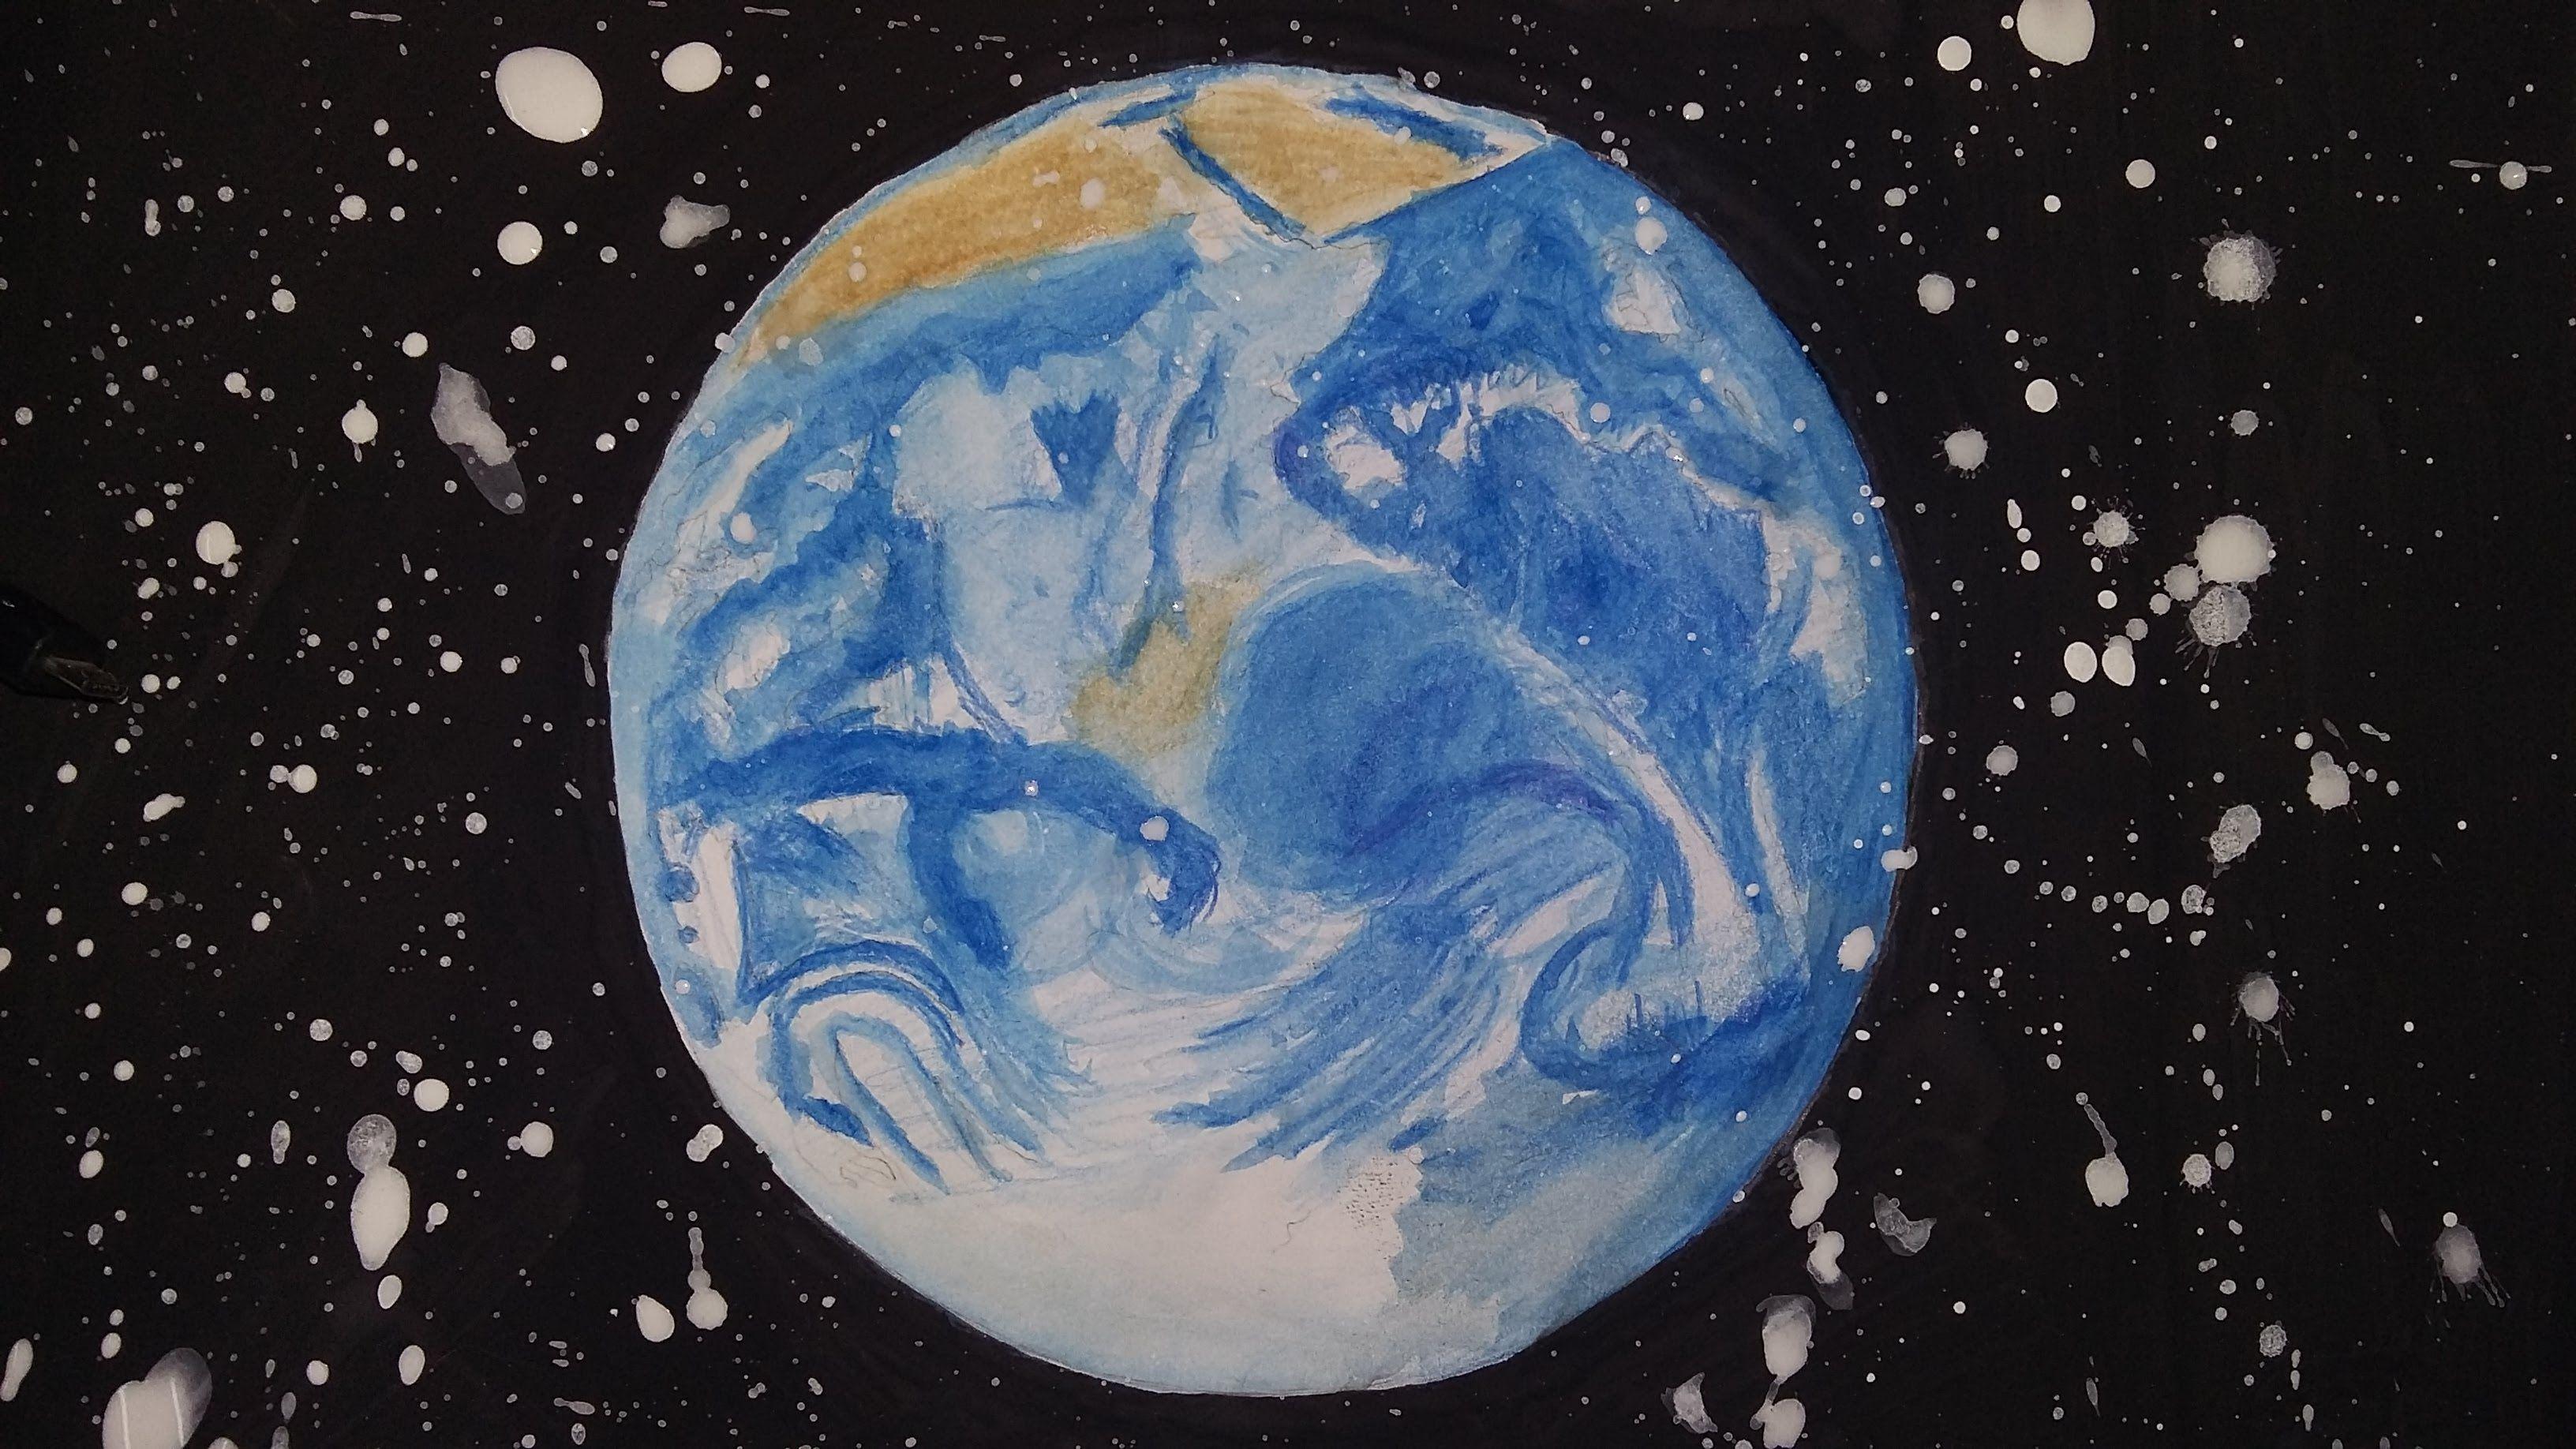 صور رسومات بالوان الاكرلاك Yahoo Image Search Results Painting Art